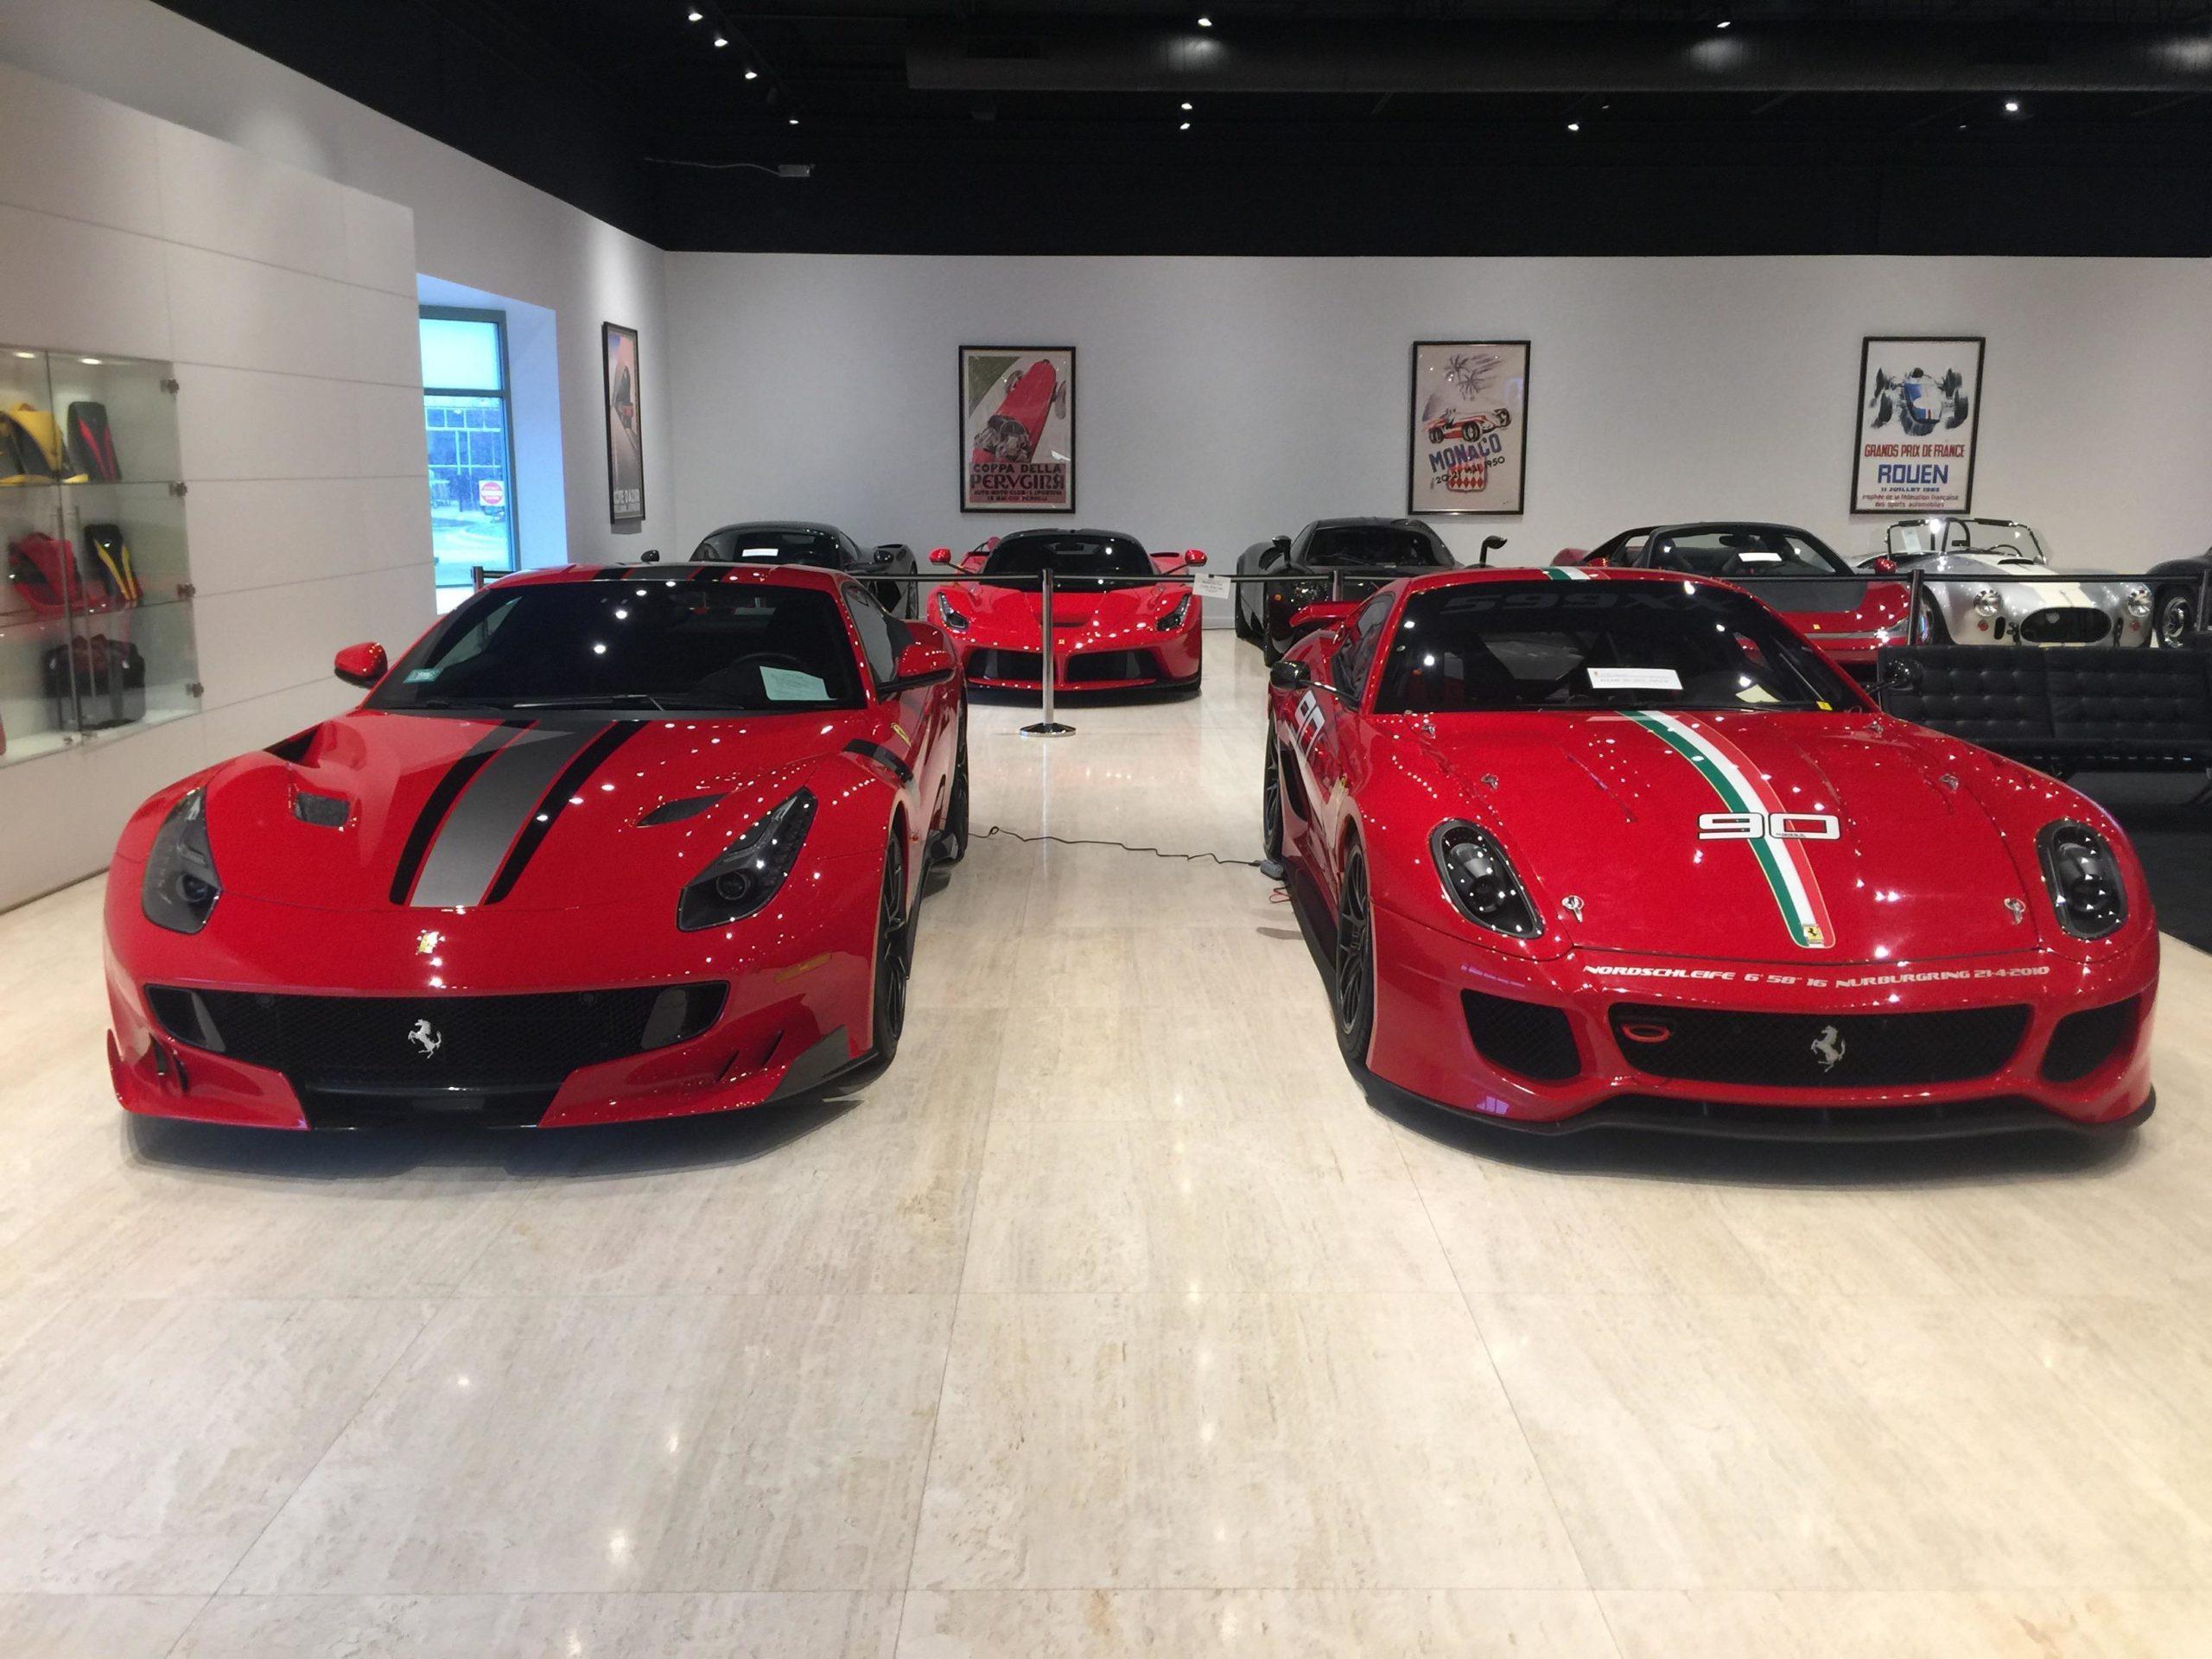 Such a gorgeous collection of cars. Ferrari F12 TDF and Ferrari 599XX.